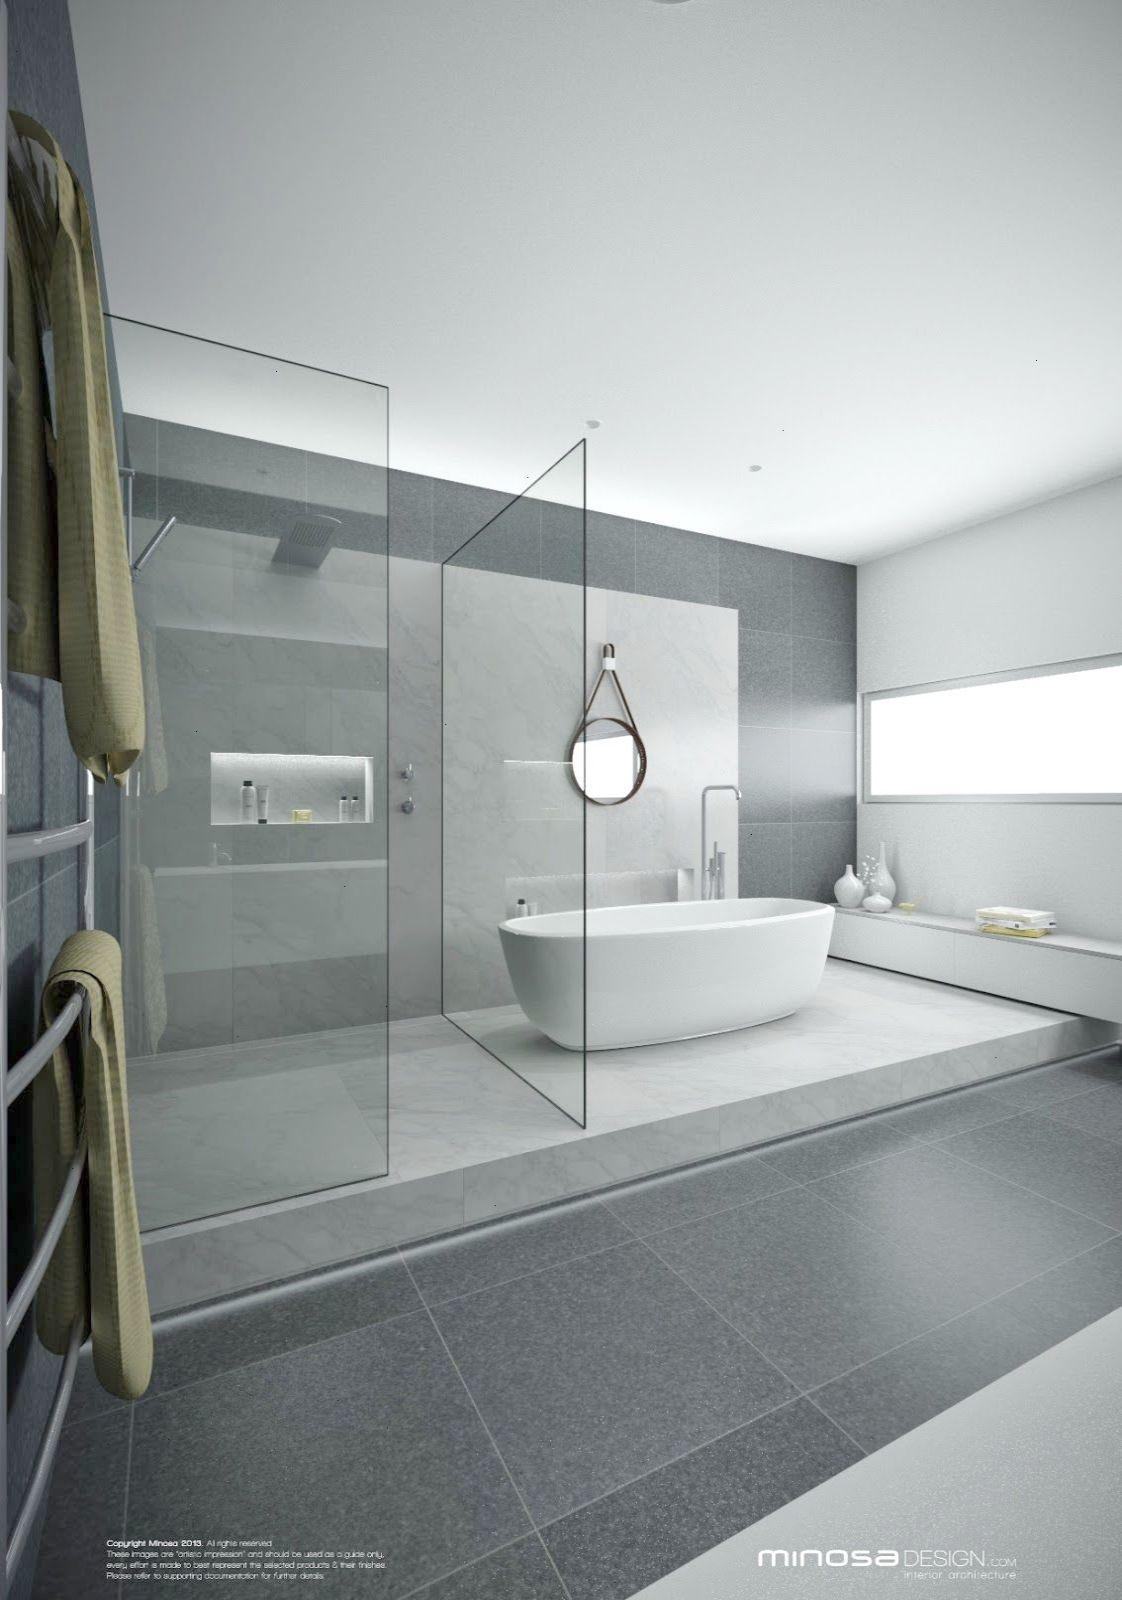 Modern Kitchen And Bathroom Design Solutions Award Winning Design Studio For The Kitchen Bathroo Minimalism Interior Modern Bathroom Design Bathroom Interior